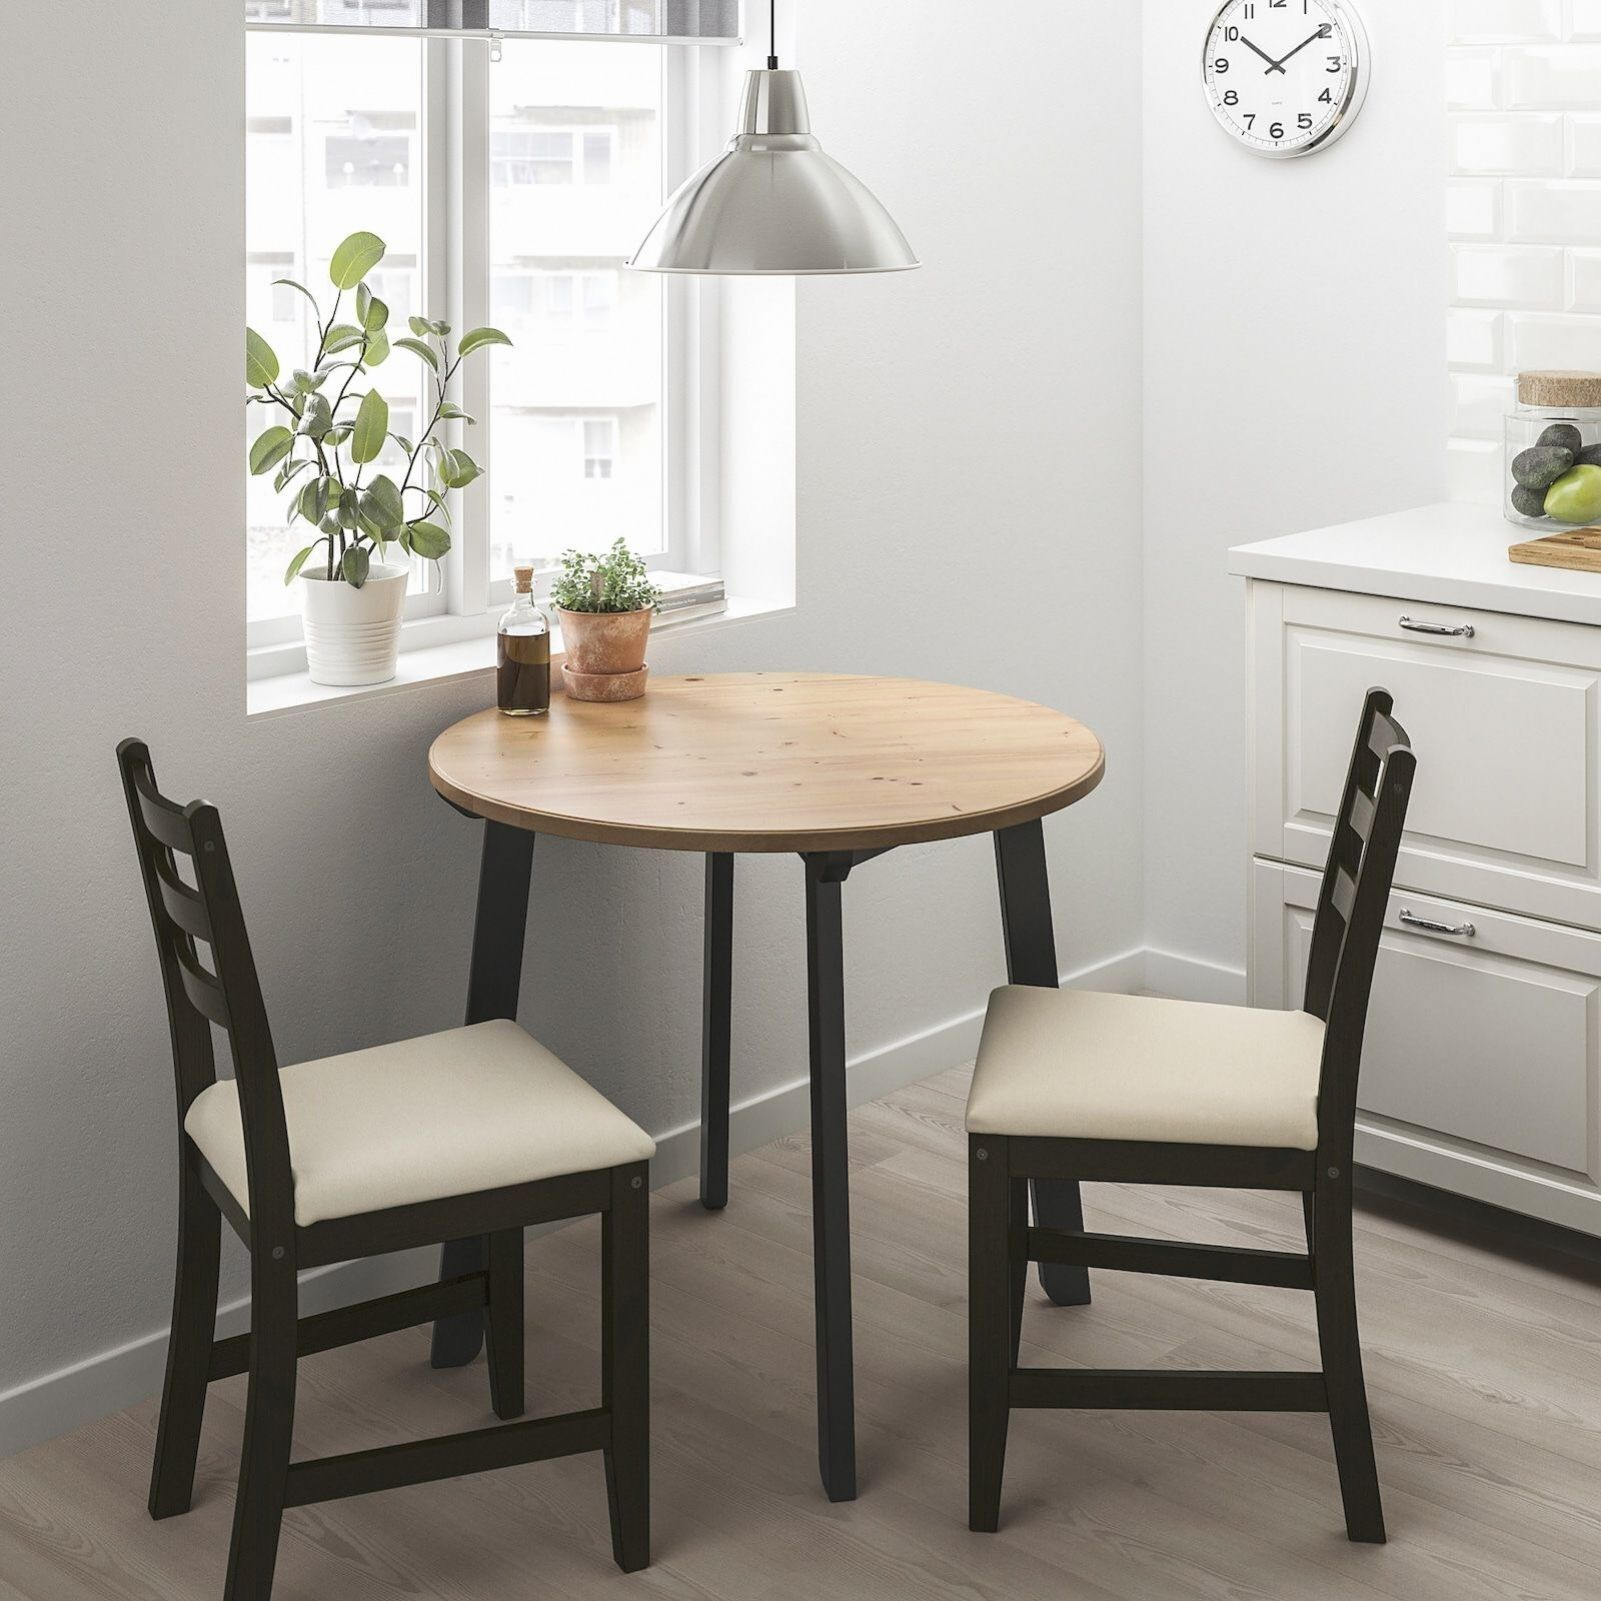 Gamlared Lerhamn Table Et 2 Chaises Inte Antique Clair Brun Noir Ttaryd Beige Ikea En 2020 Petite Table A Manger Salle A Manger Table Ronde Table Ikea